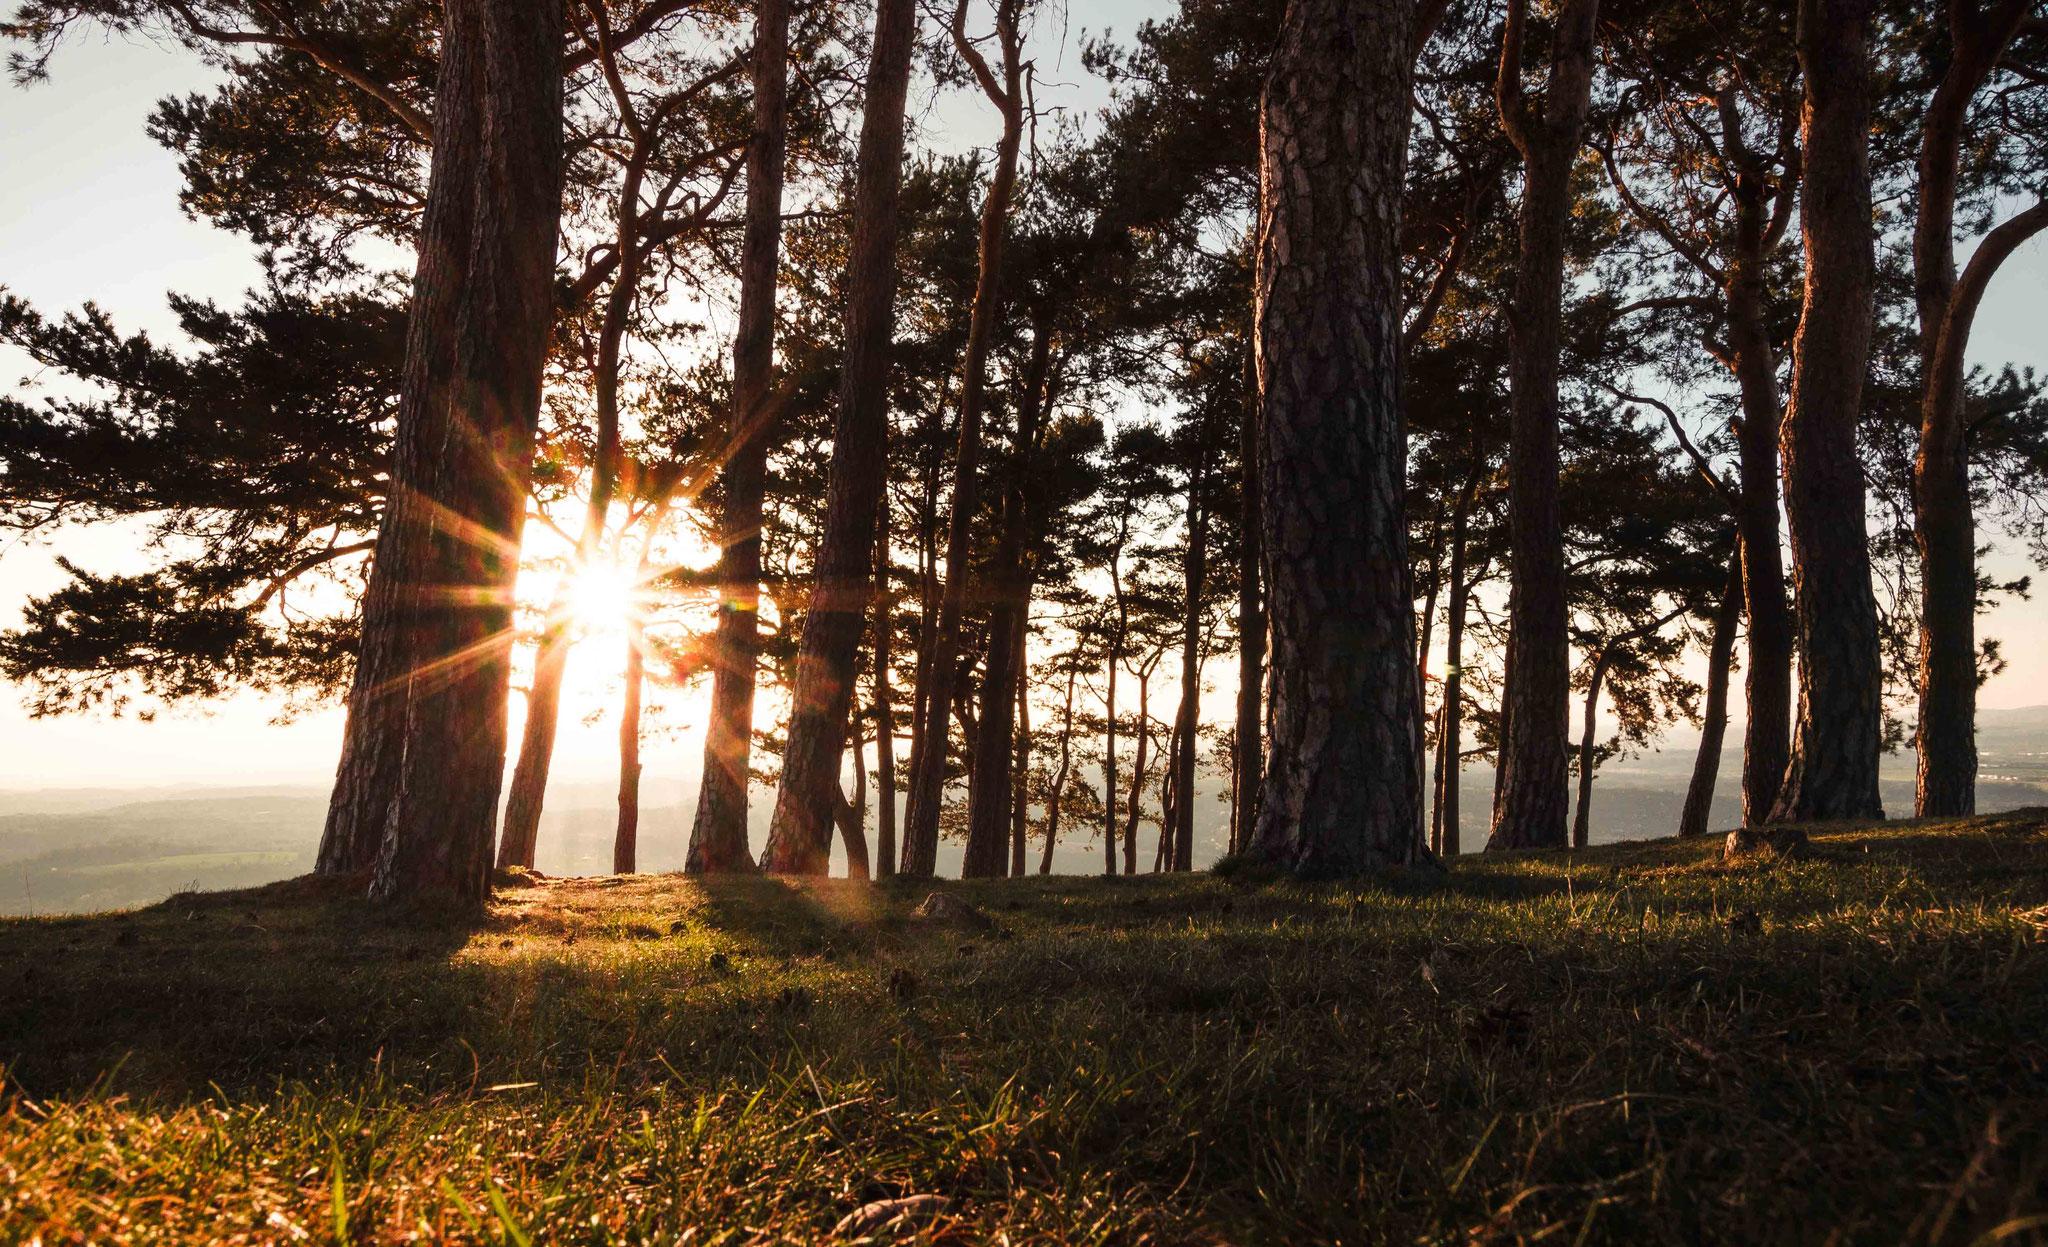 Sonnen durchfluteter Wald; Hohen Bohl